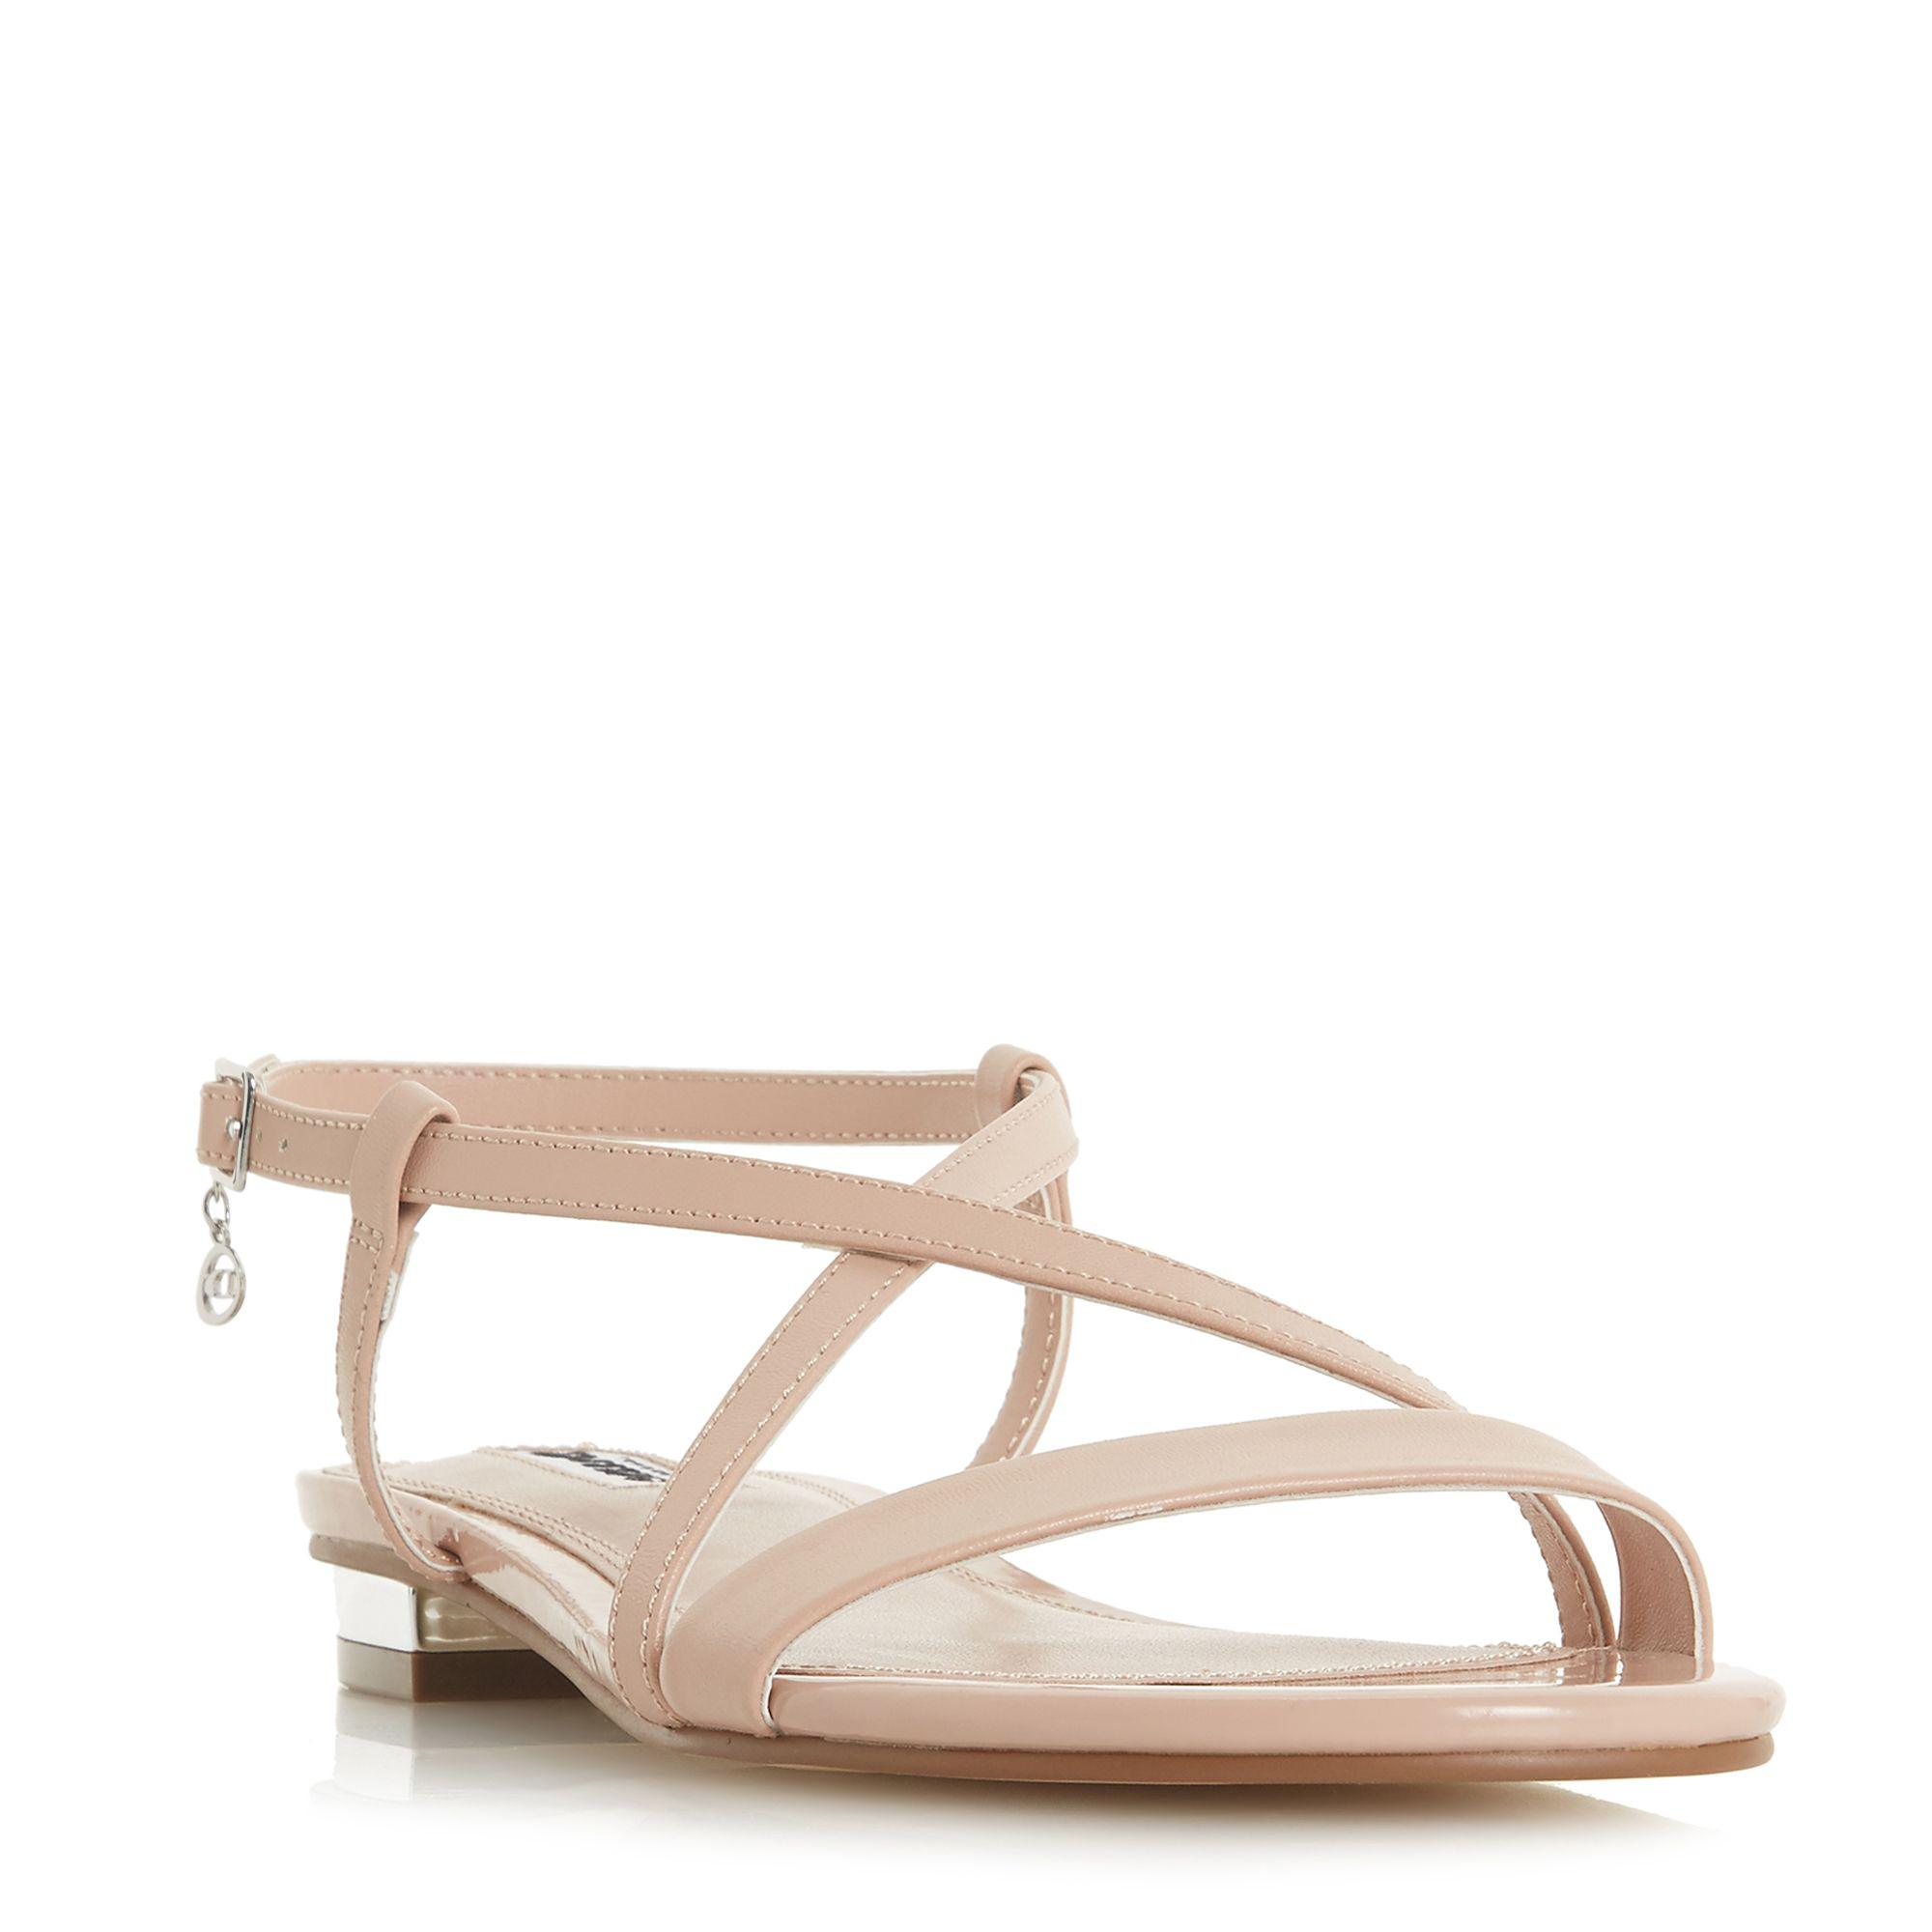 81cb41f9a9e1 Dune Natural  nenna  Block Heel T-bar Sandals in Natural - Save 31 ...